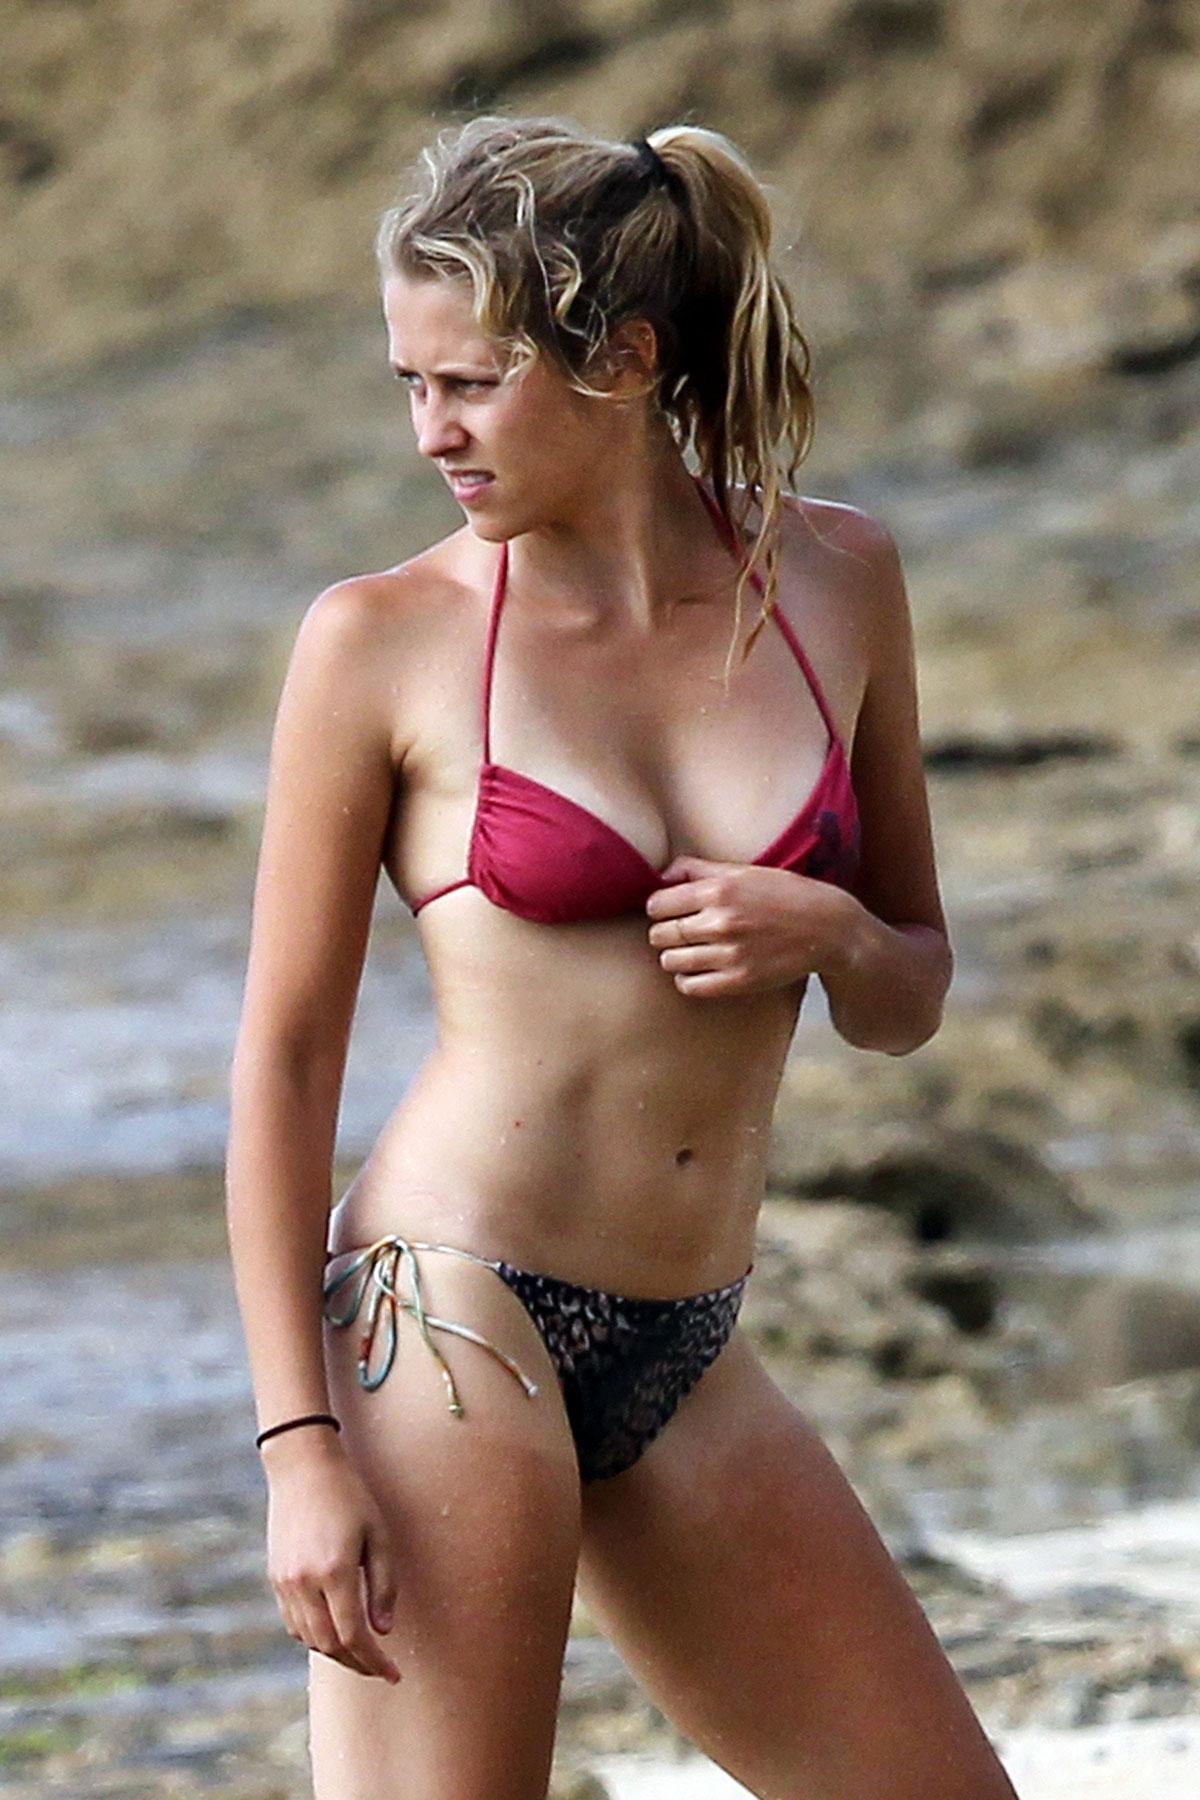 Natalie bassingthwaite in bikini images